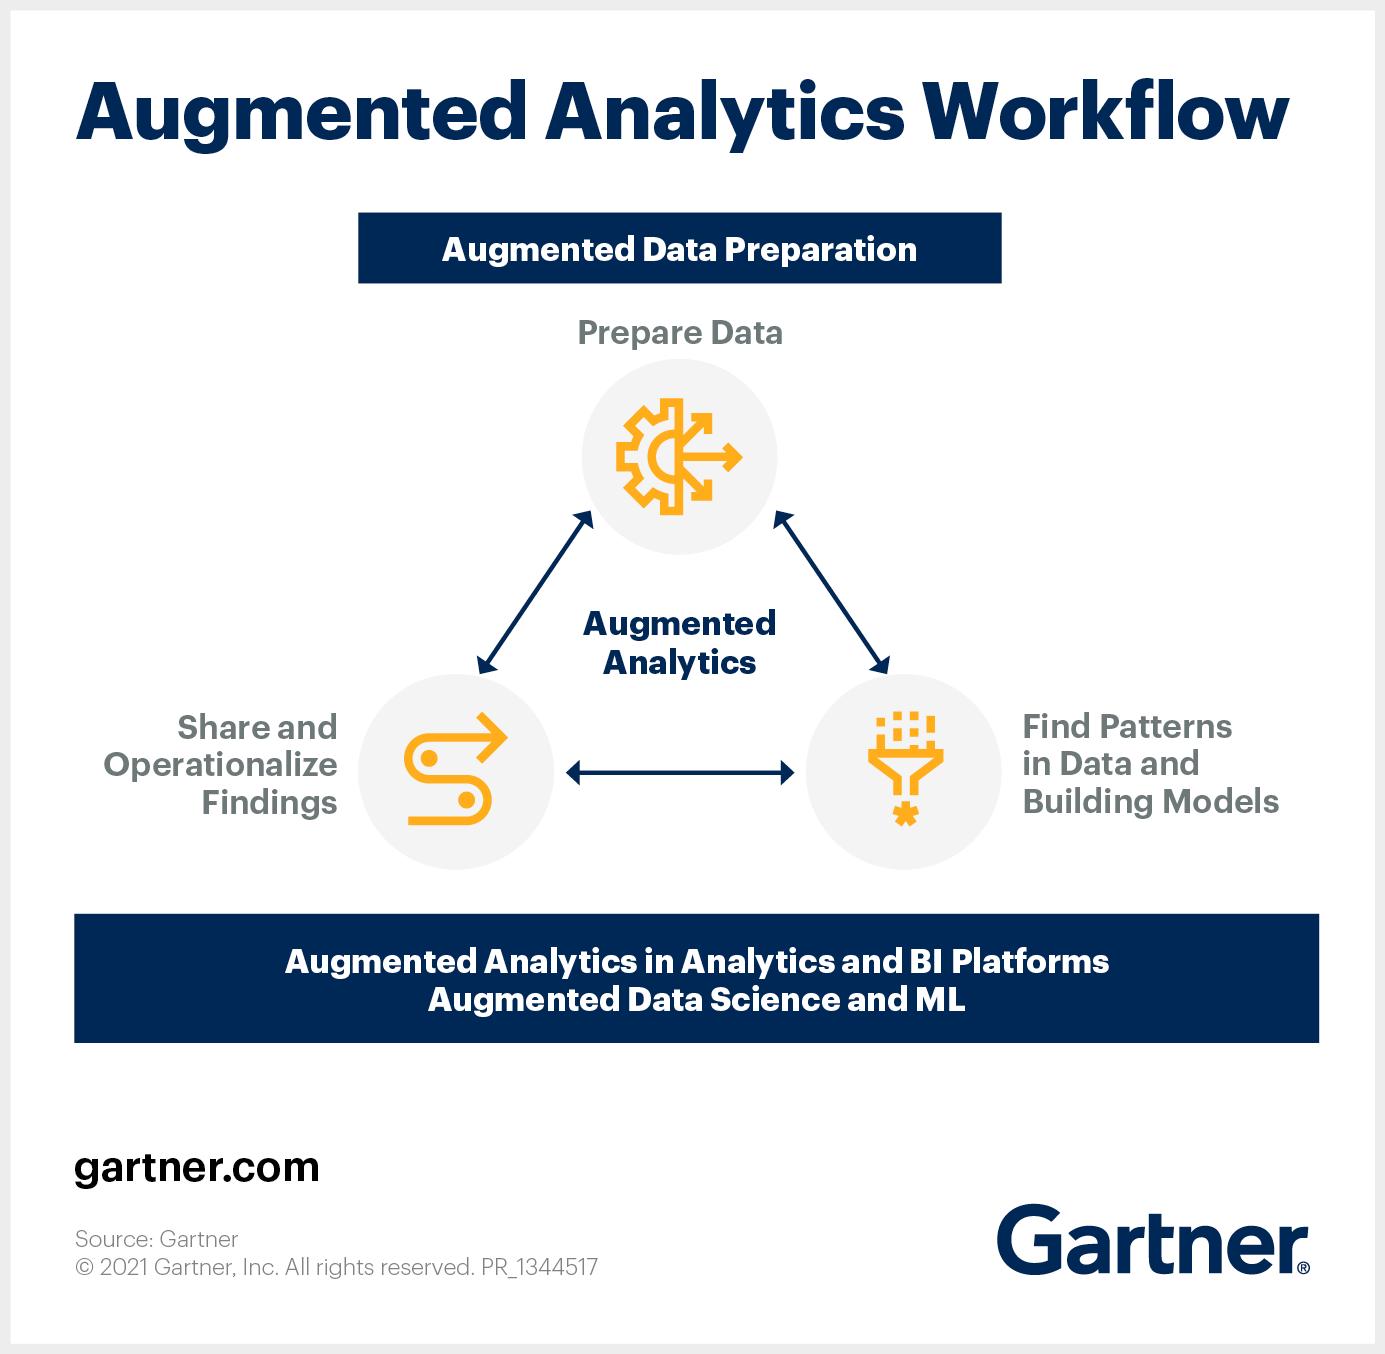 Augmented Analytics Workflow